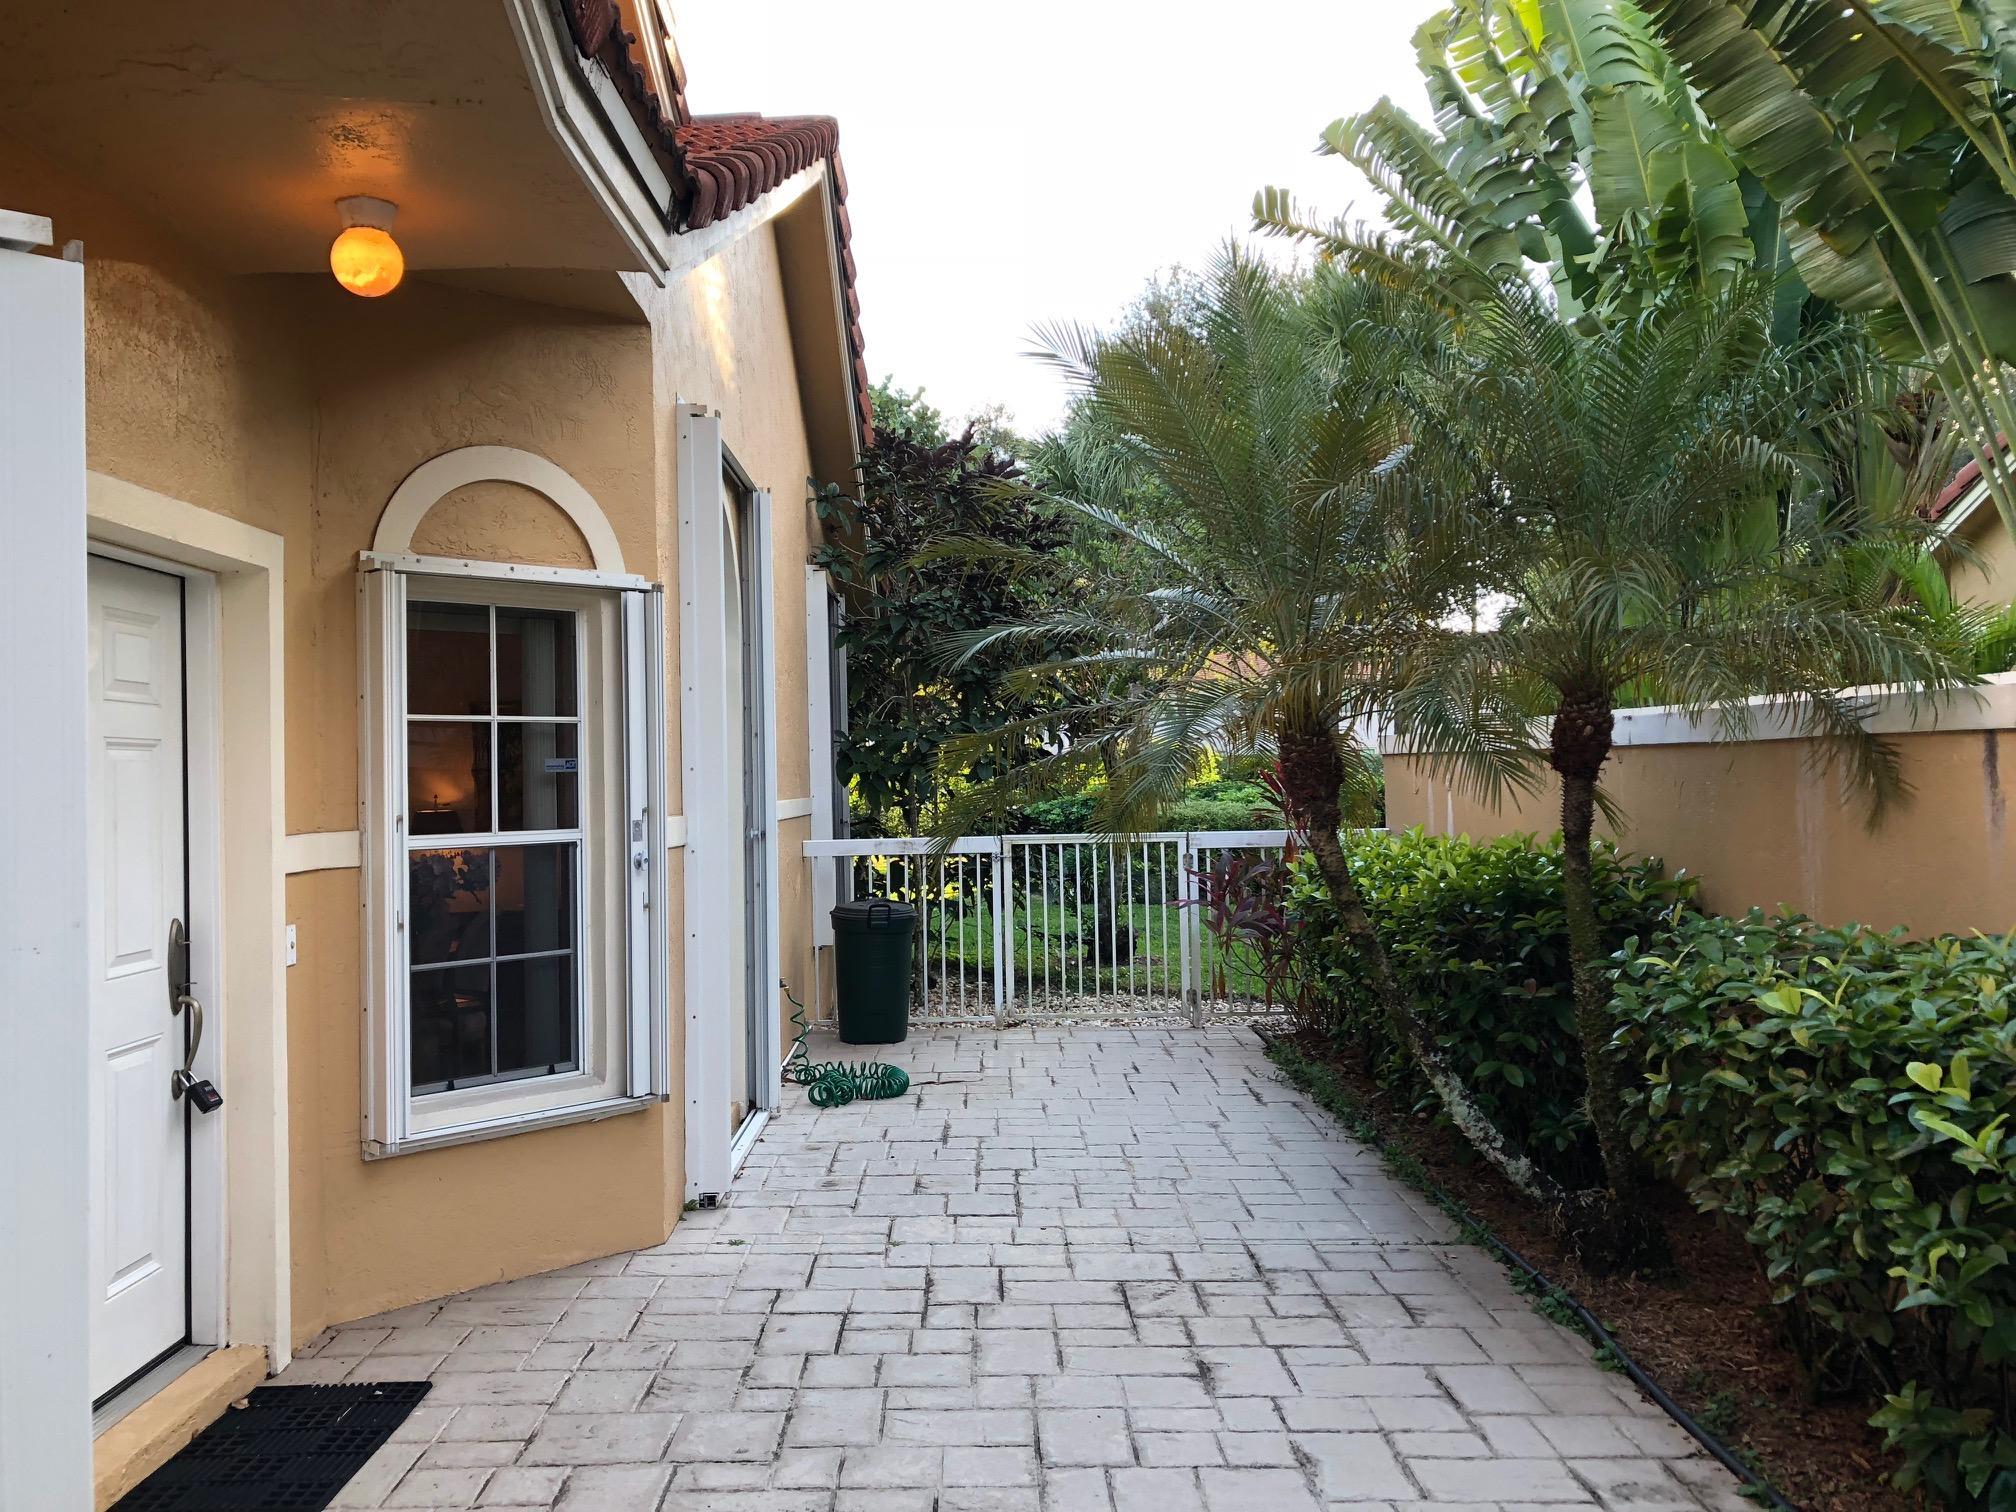 Home for sale in Misty Oaks Pompano Beach Florida